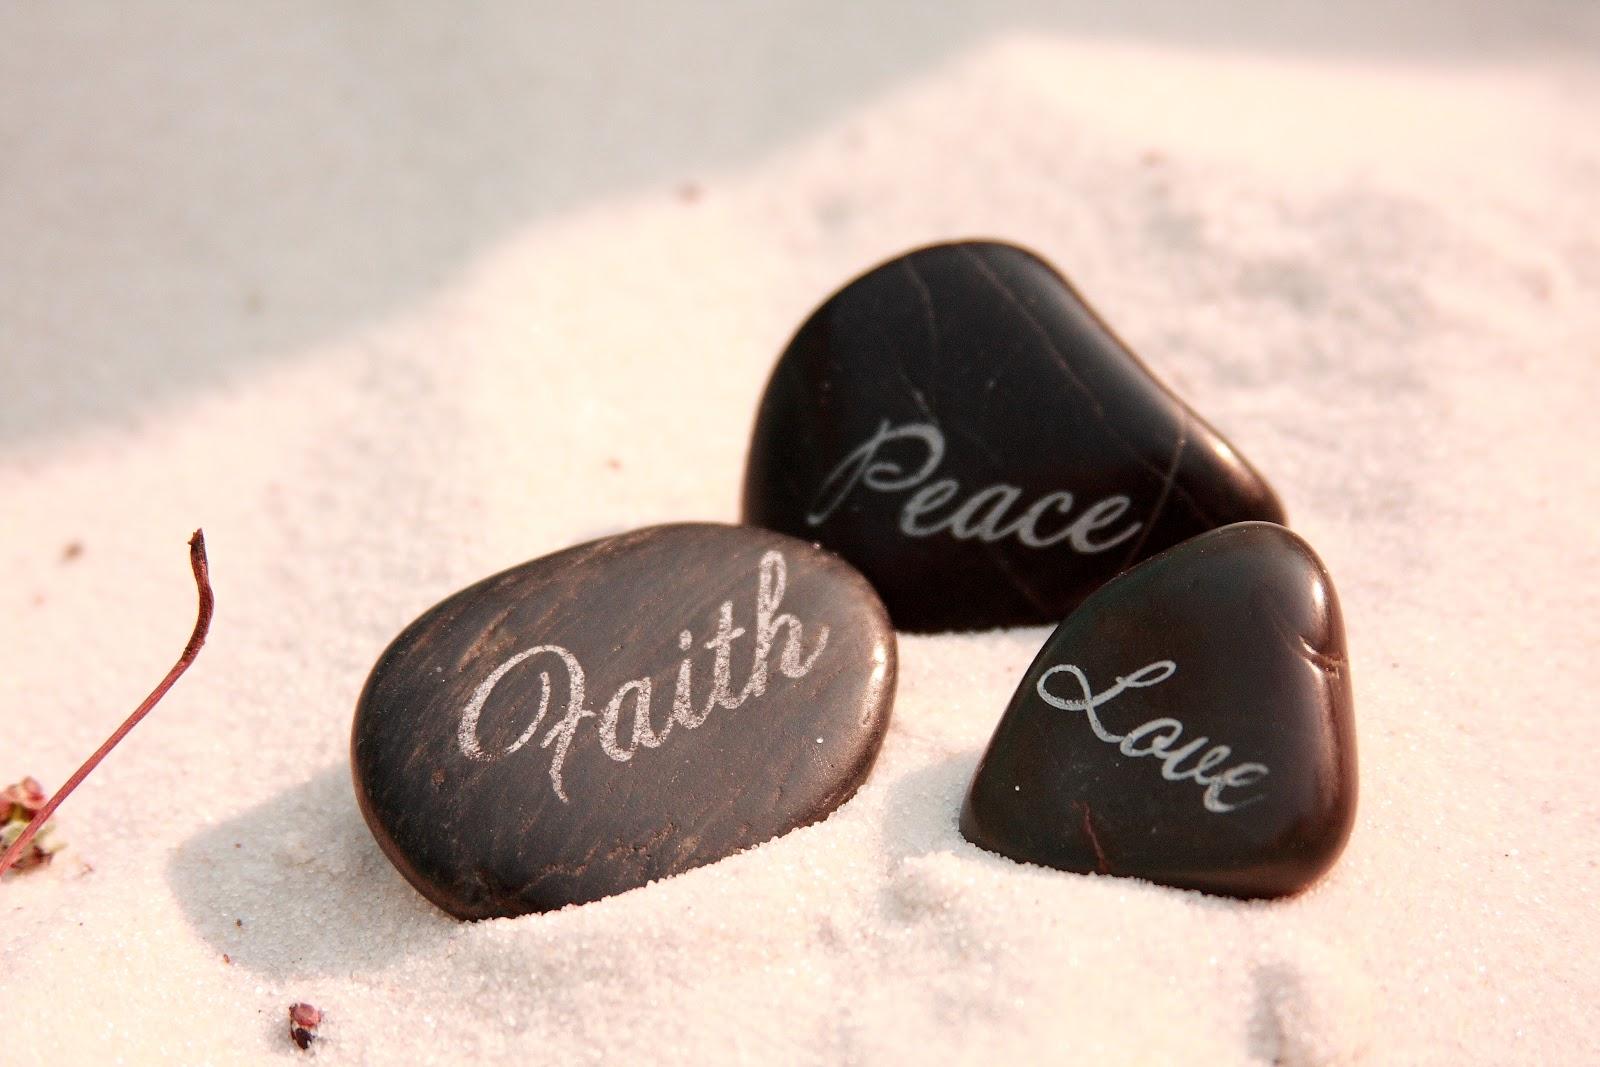 Inspirational Garden Stones - PictureIt Creations, LLC on